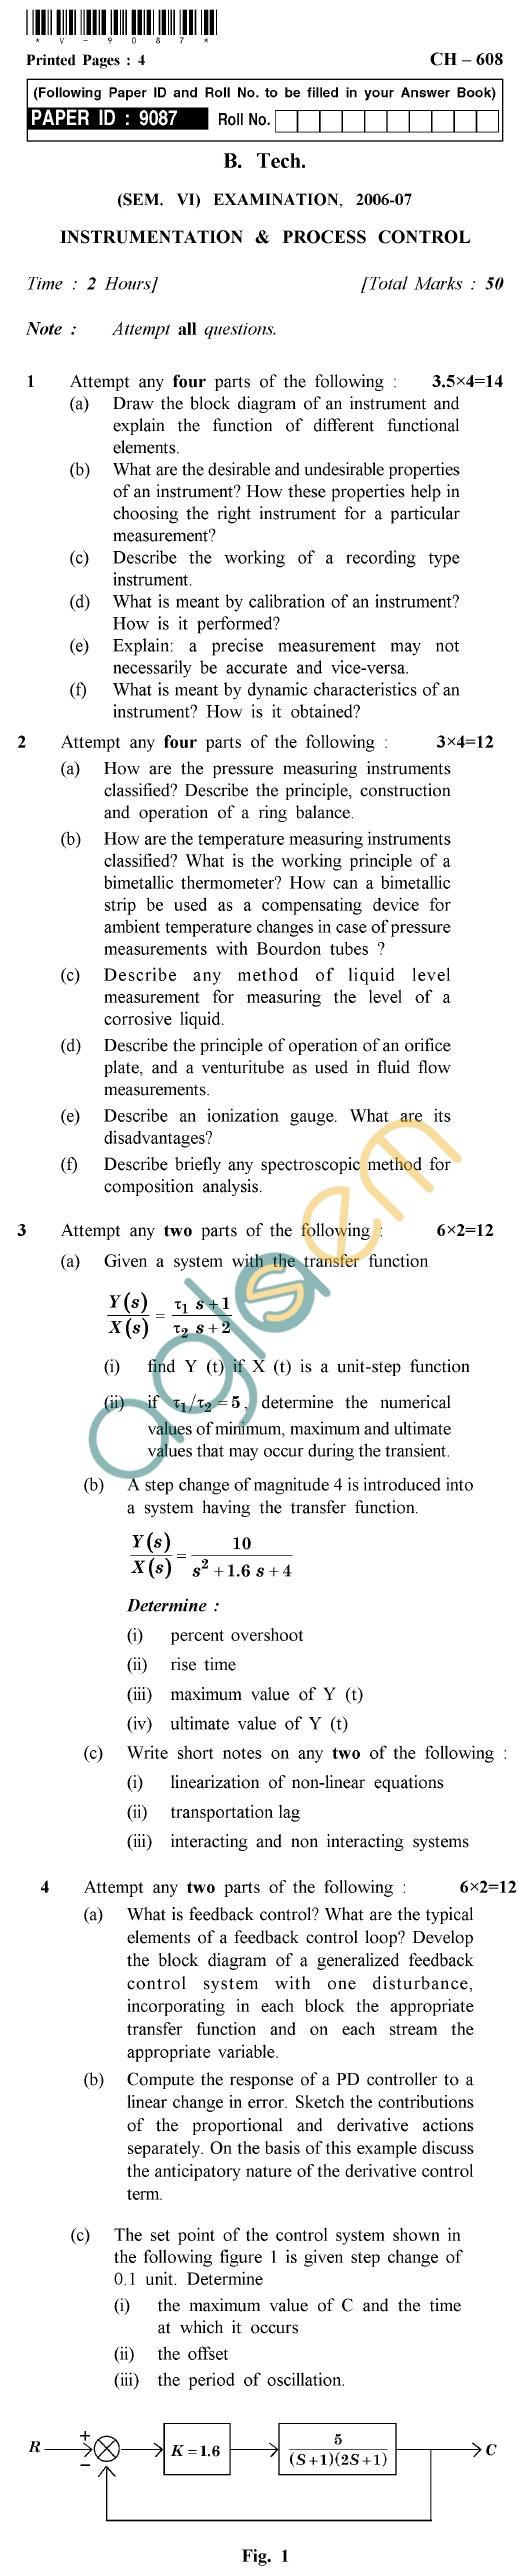 UPTU B.Tech Question Papers - CH-608 - Instrumentation & Process Control